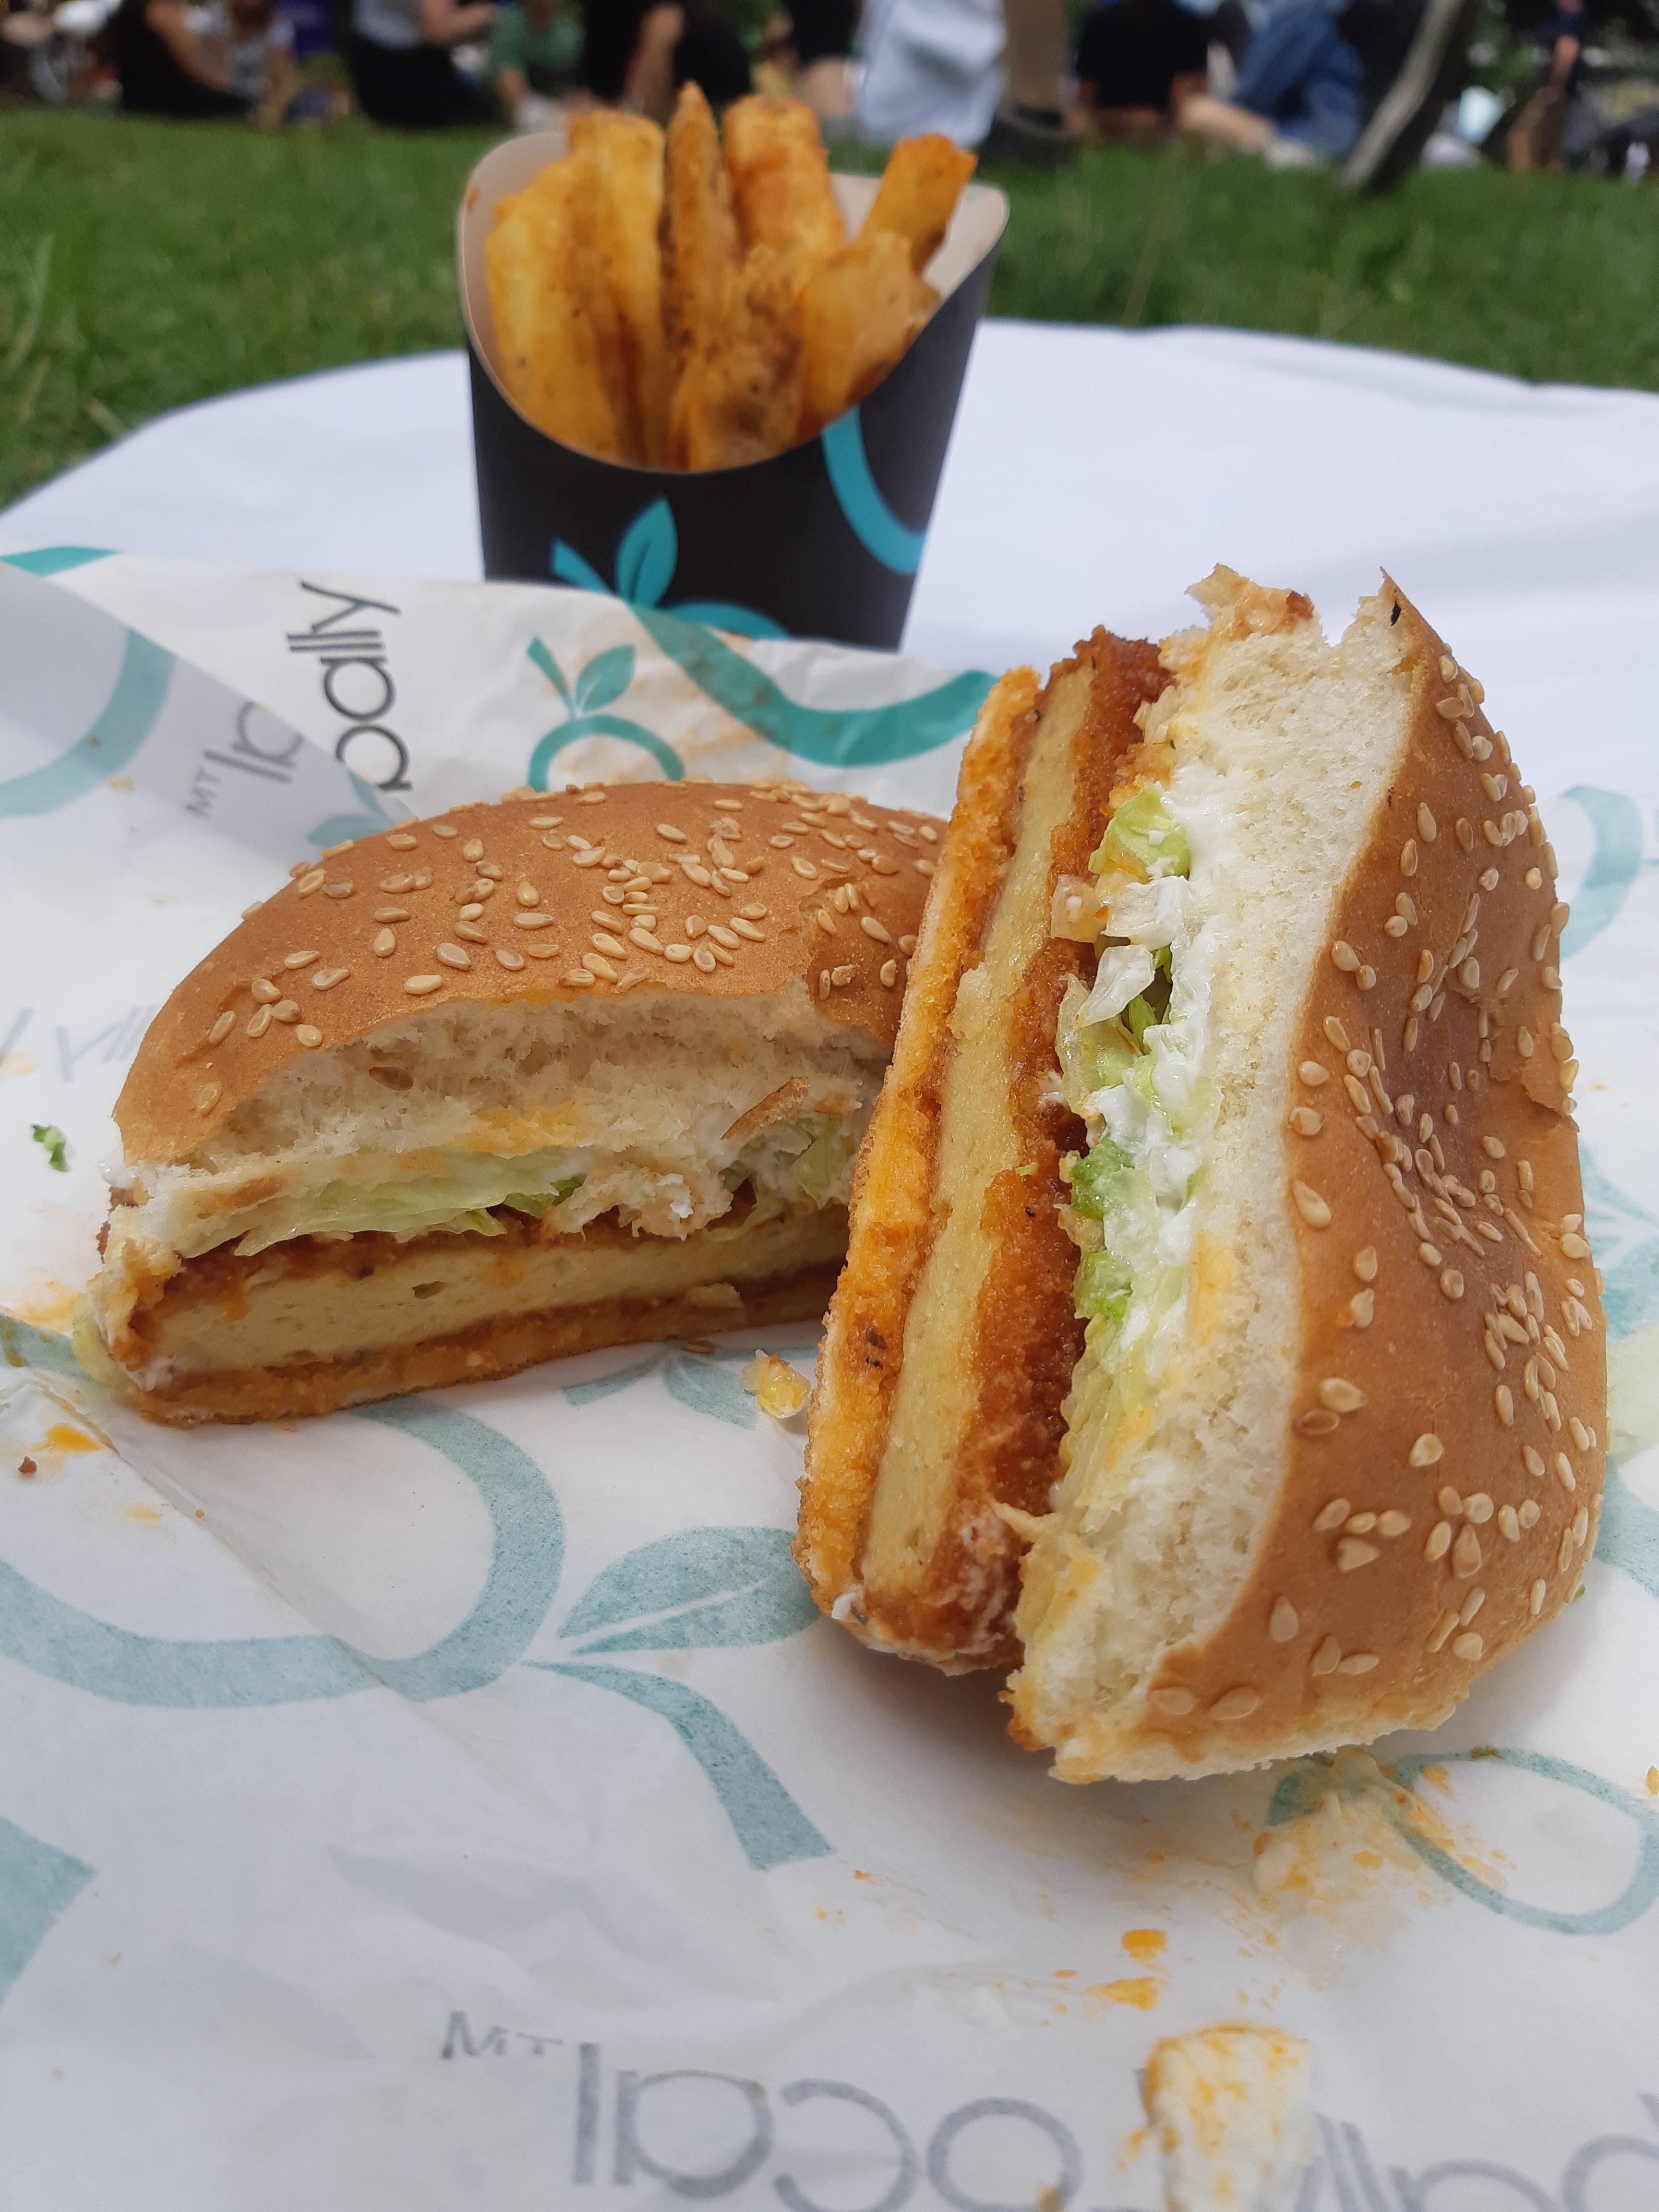 AterImber.com - The Veg Life - Vegandale Festival 2019 Review - Globally Local Buffalo ChickUn Burger and Fries - vegan food, food reviewer, vegan festival